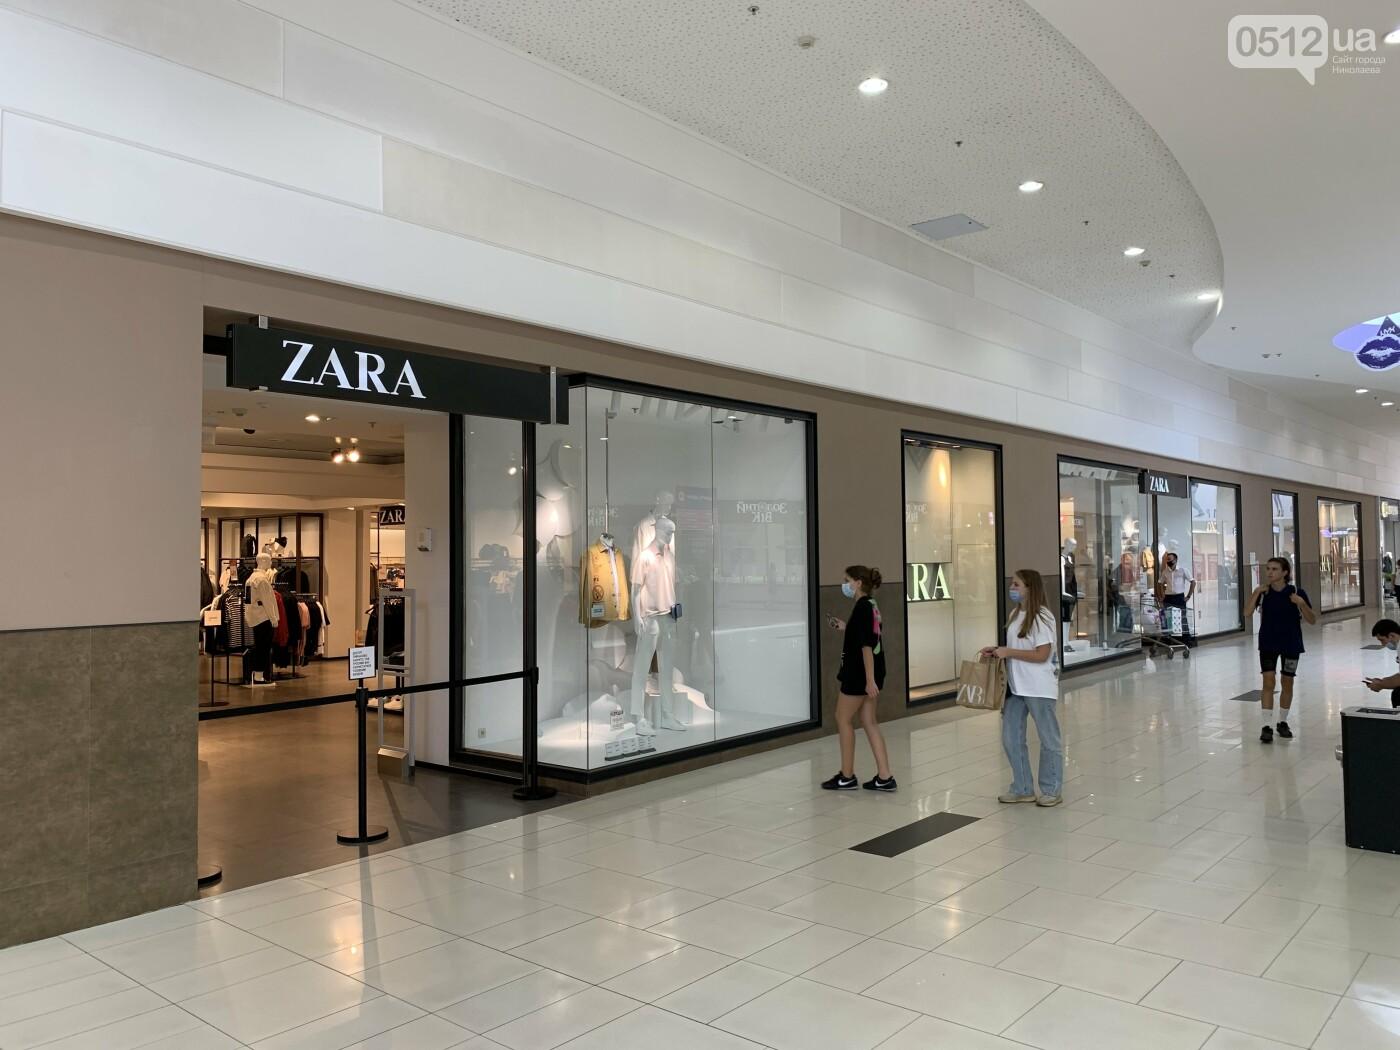 В ТРЦ Riviera новые коллекции - Раскрути Riviera на 200 000 гривен шоппинга, фото-8